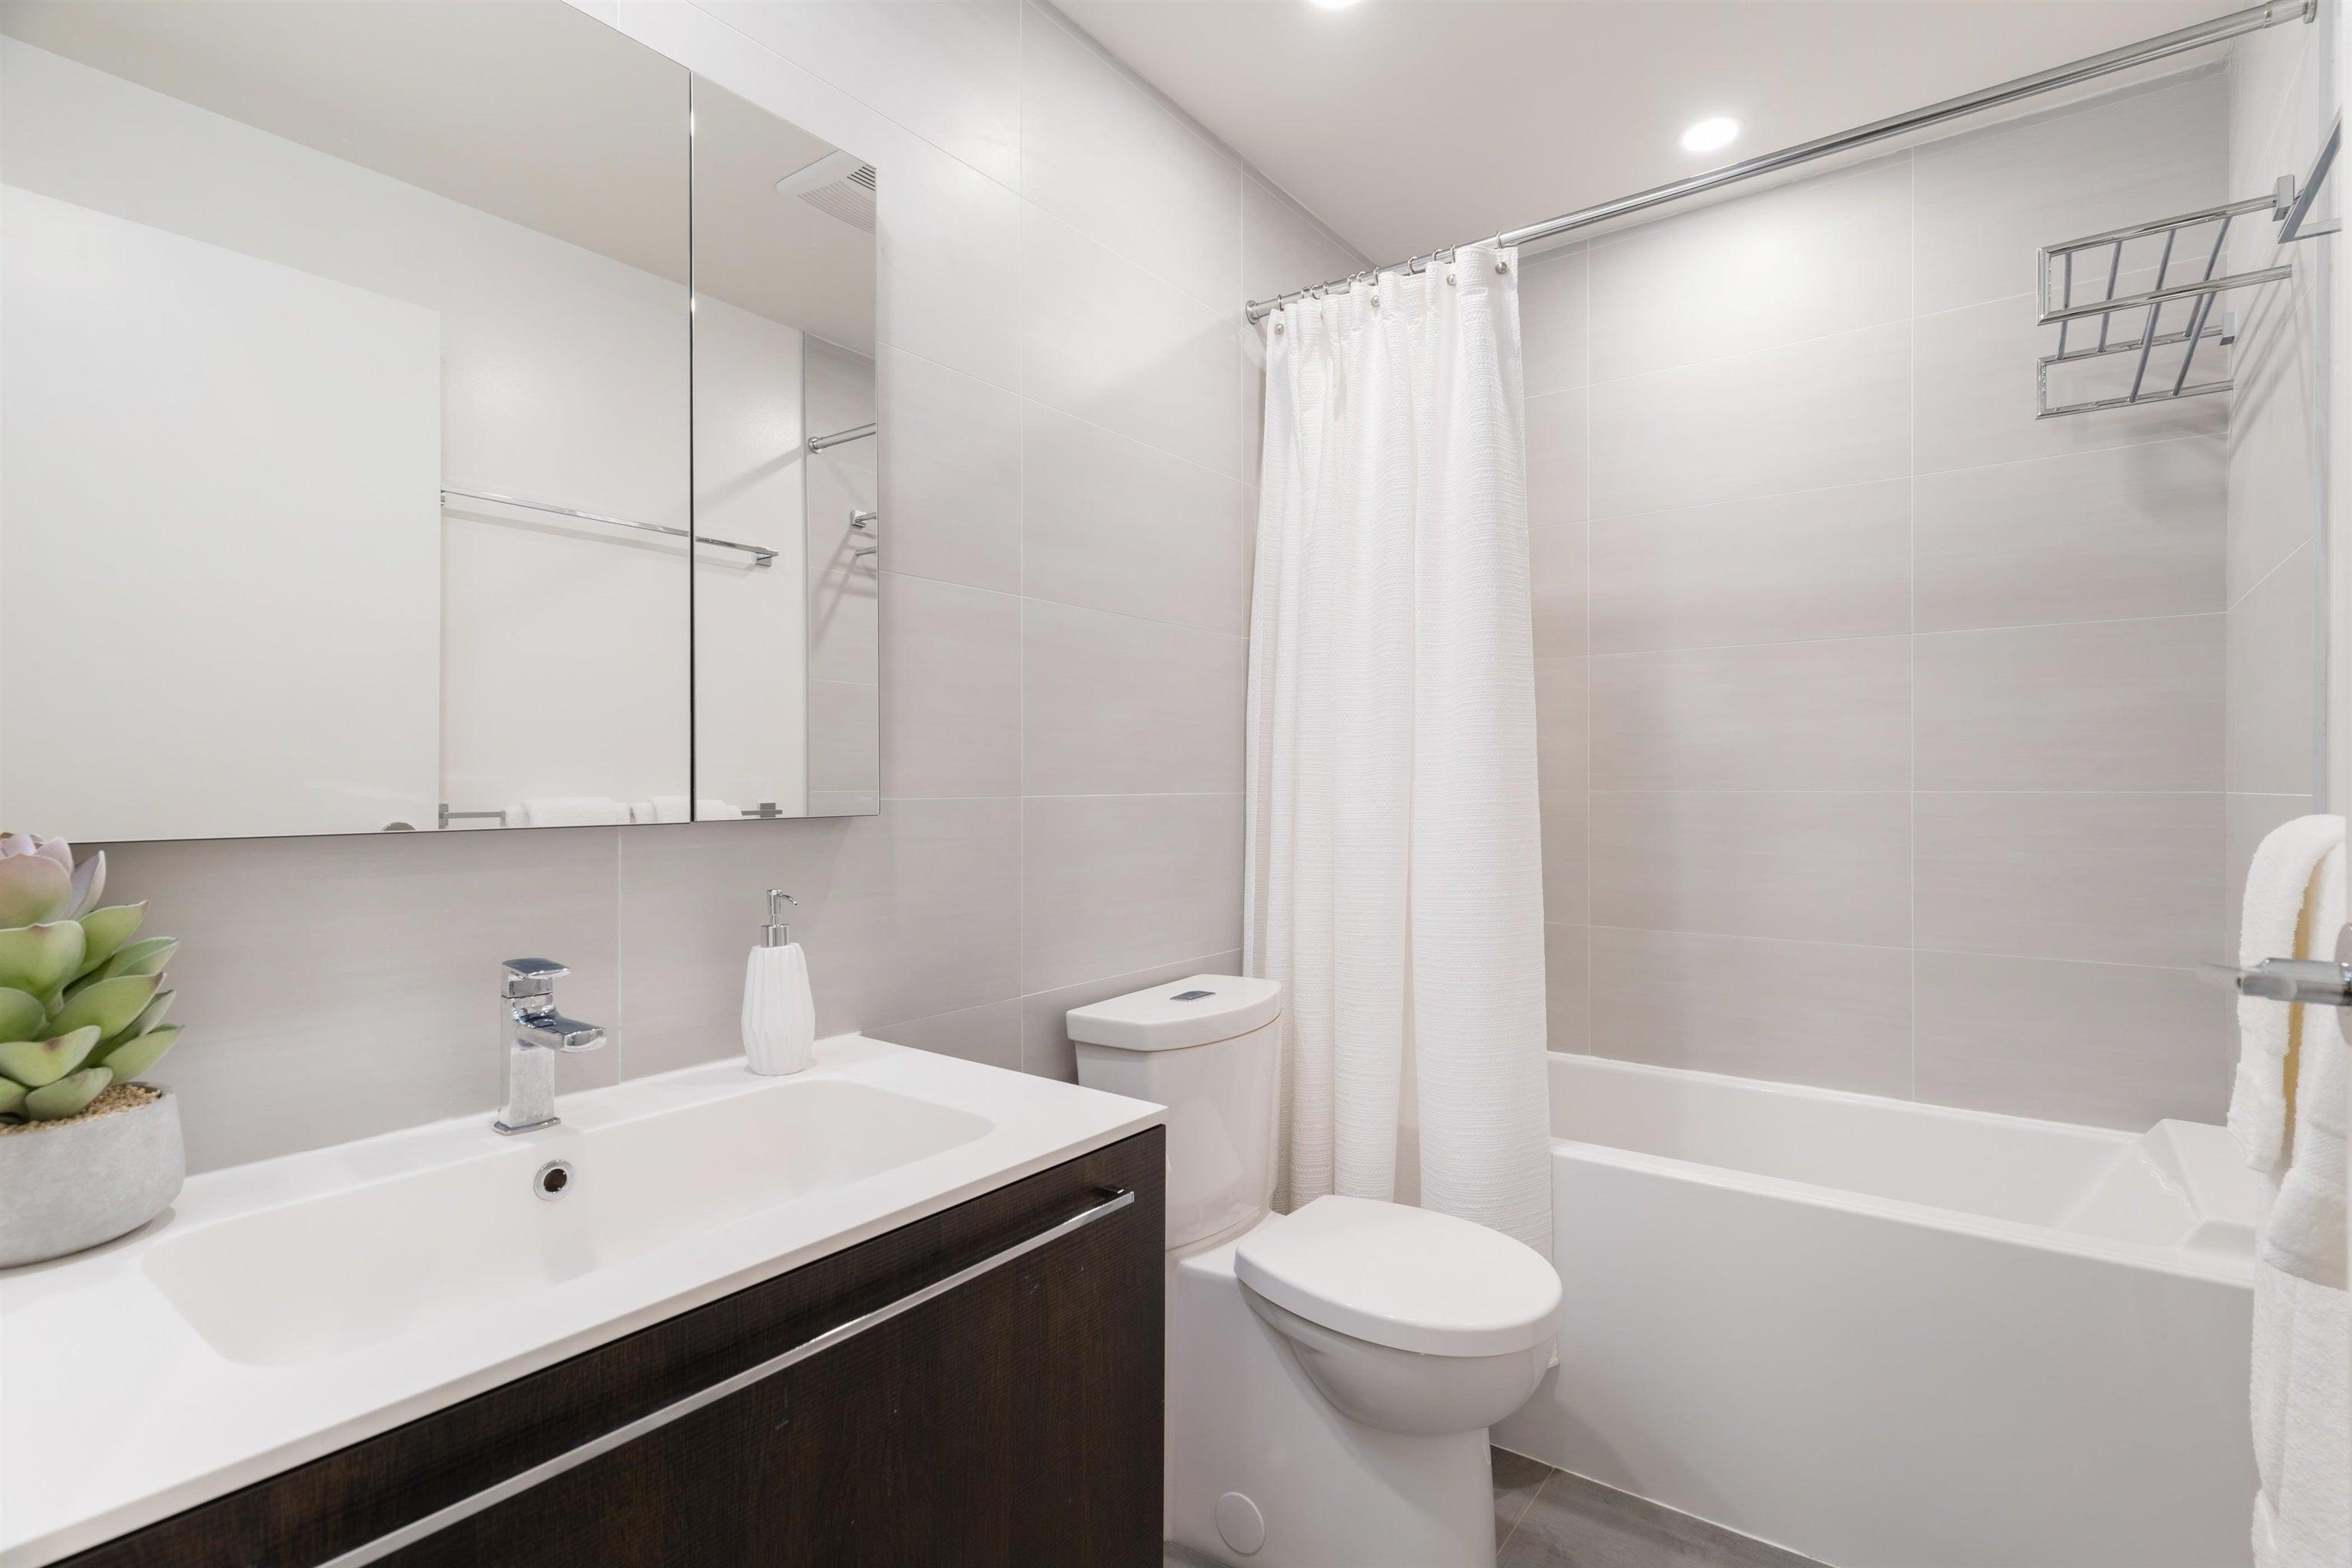 523 2508 WATSON STREET - Mount Pleasant VE Townhouse for sale, 3 Bedrooms (R2625701) - #23